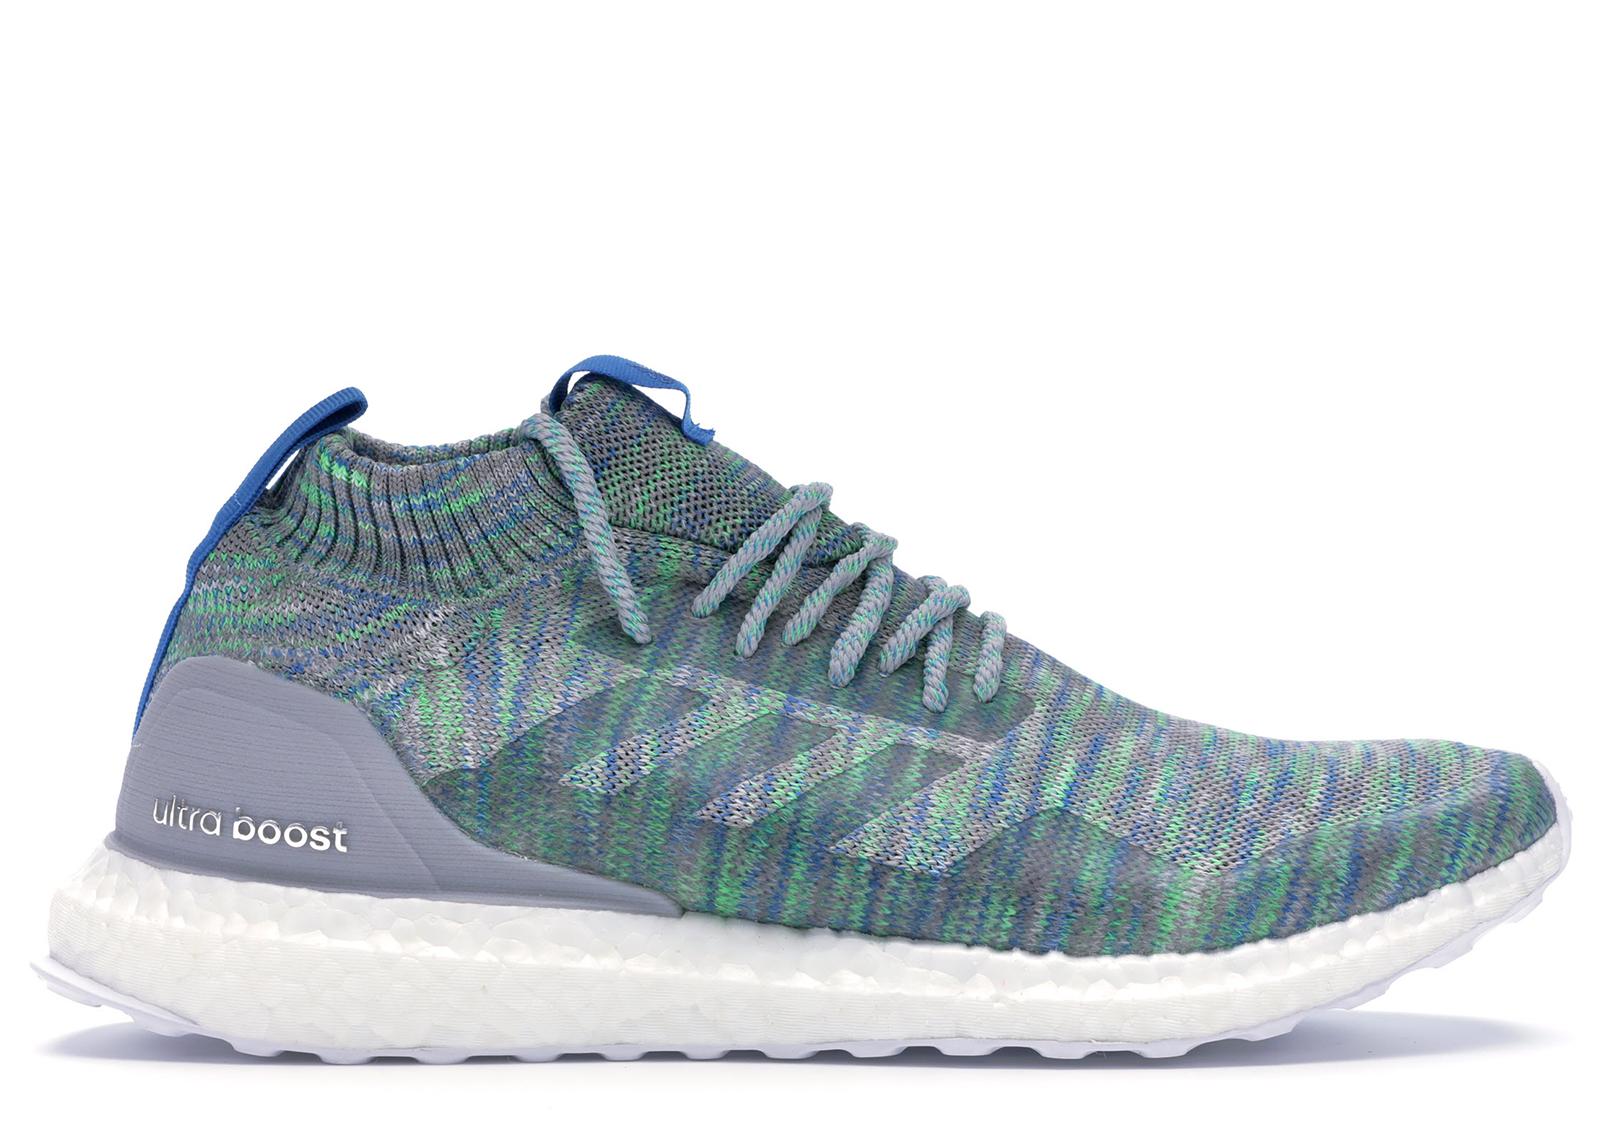 adidas Ultra Boost Mid Multi-Color Grey